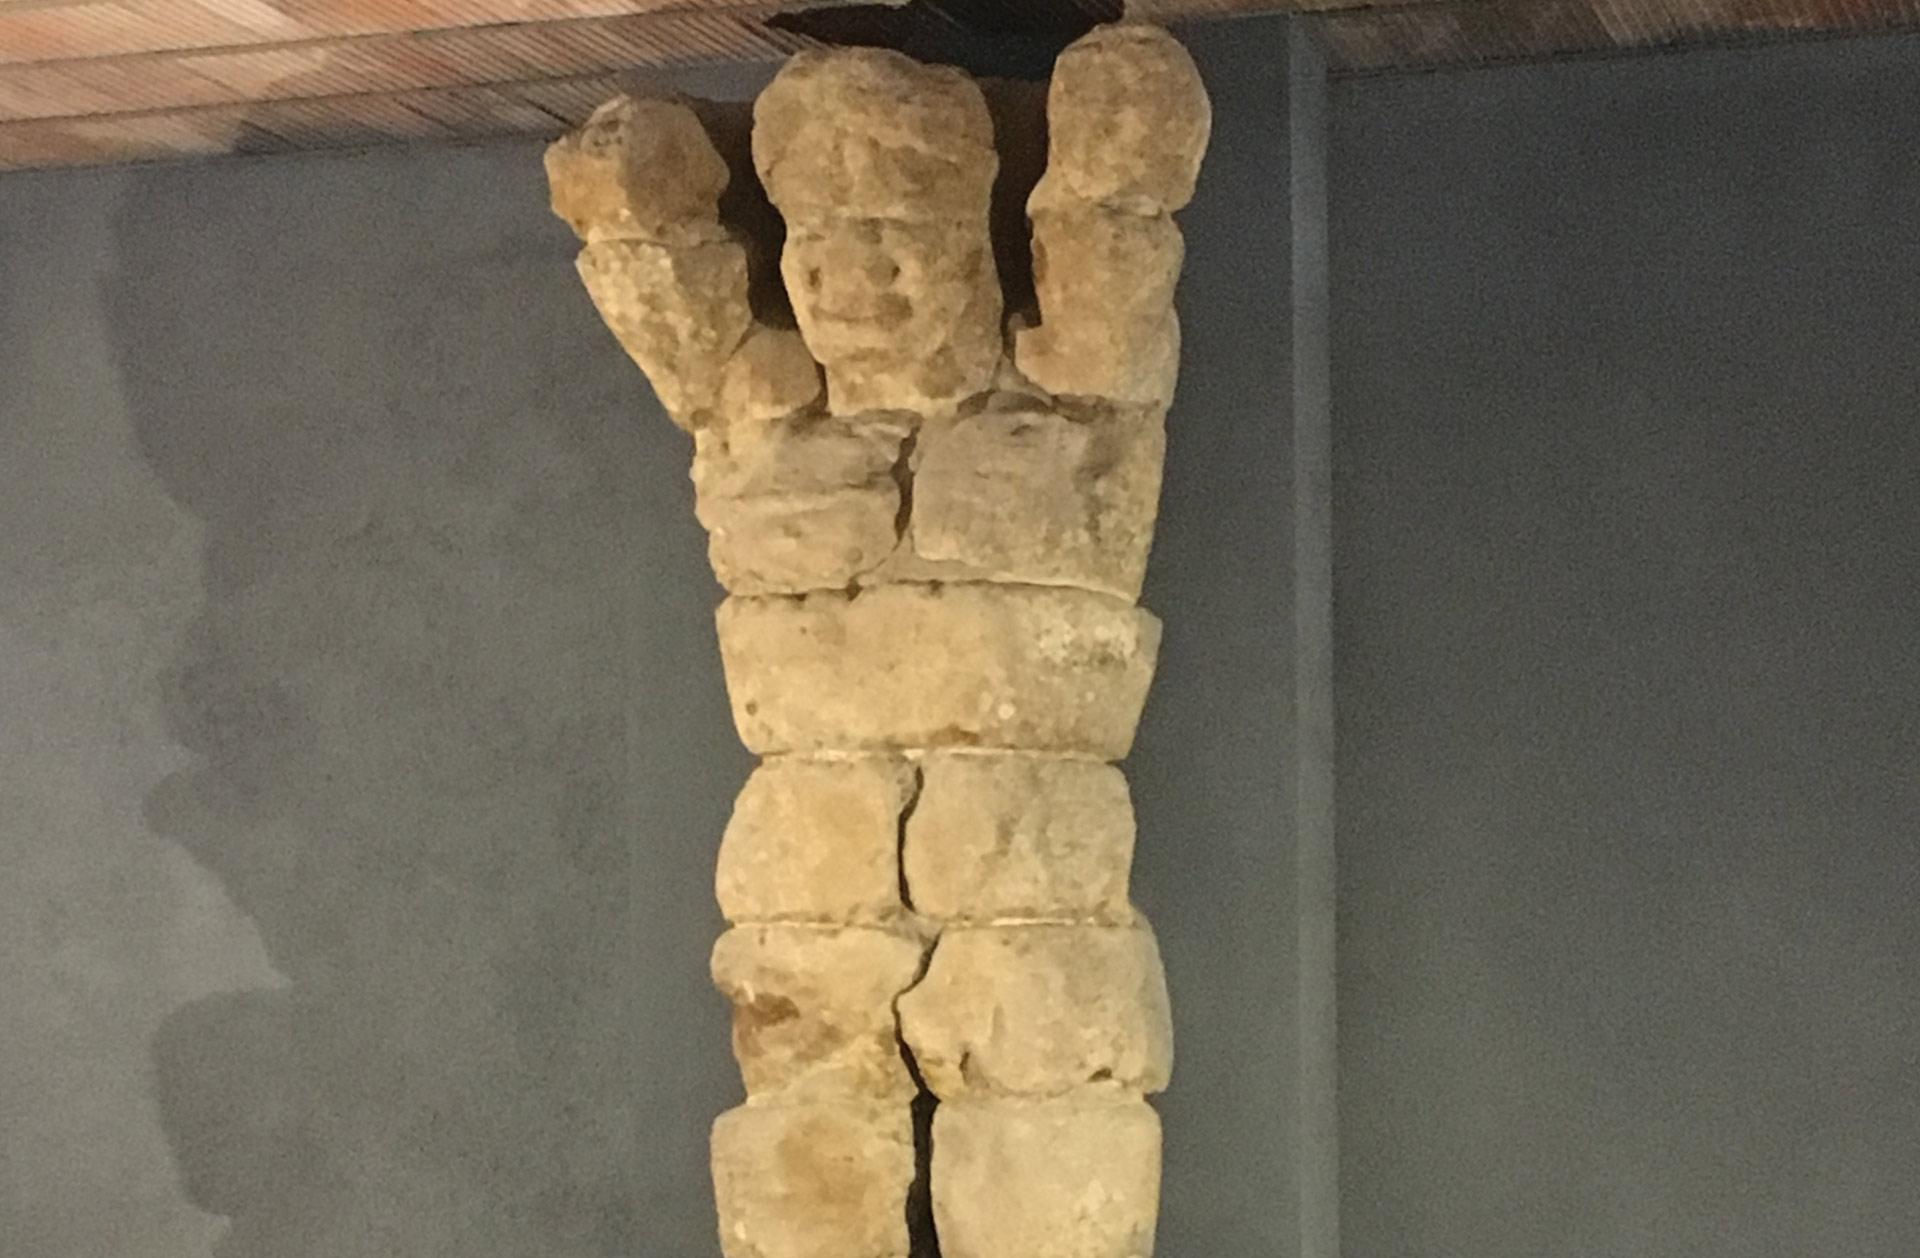 Museo-Archeologico-Regionale-Pietro-Griffo-1.jpg ... f6b8942d194b